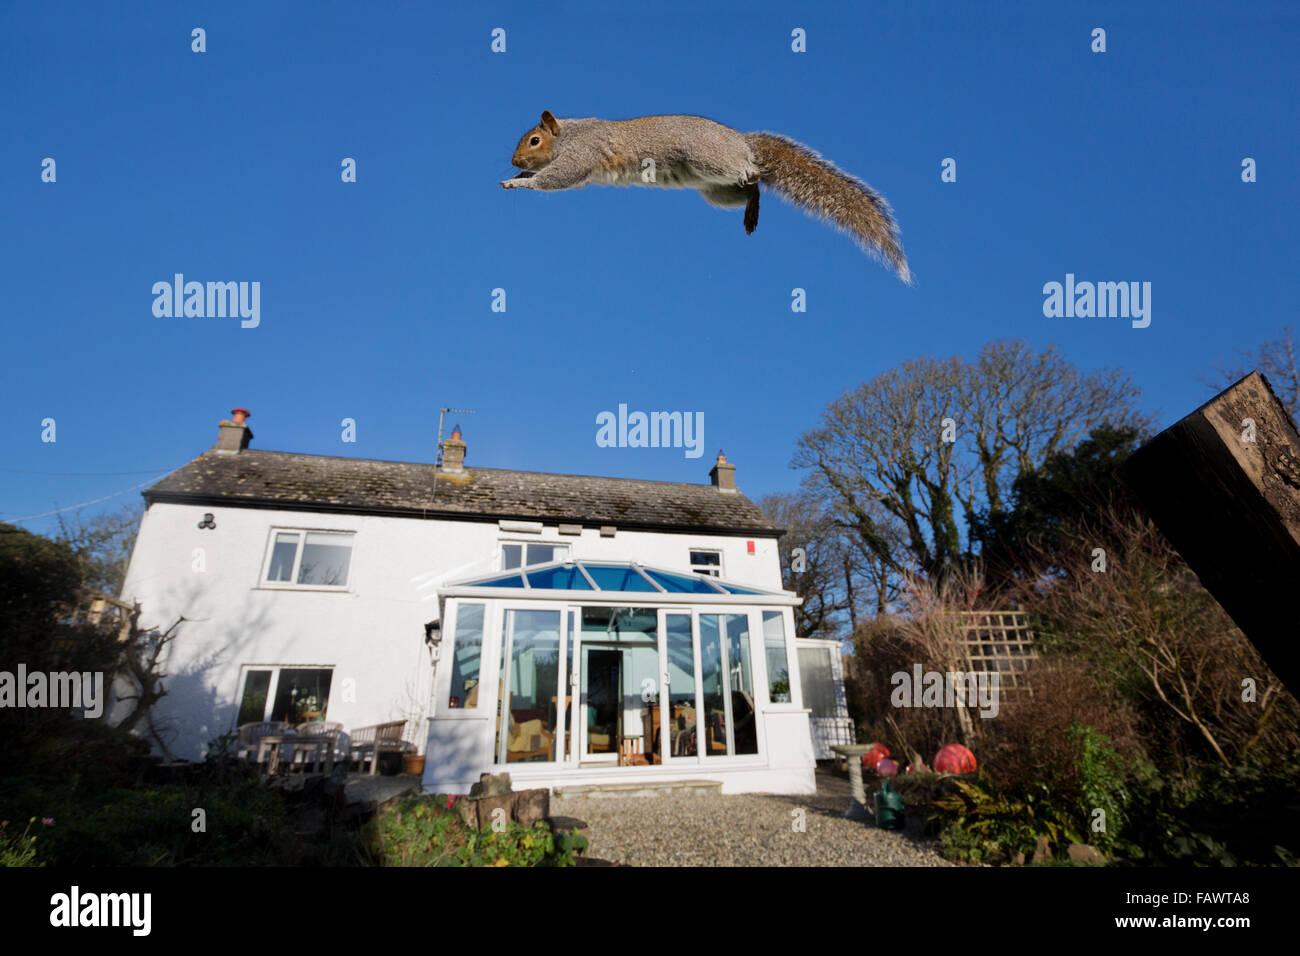 Grey Squirrel; Sciurus carolinensis Single Leaping to Feeder; Cornwall; UK - Stock Image